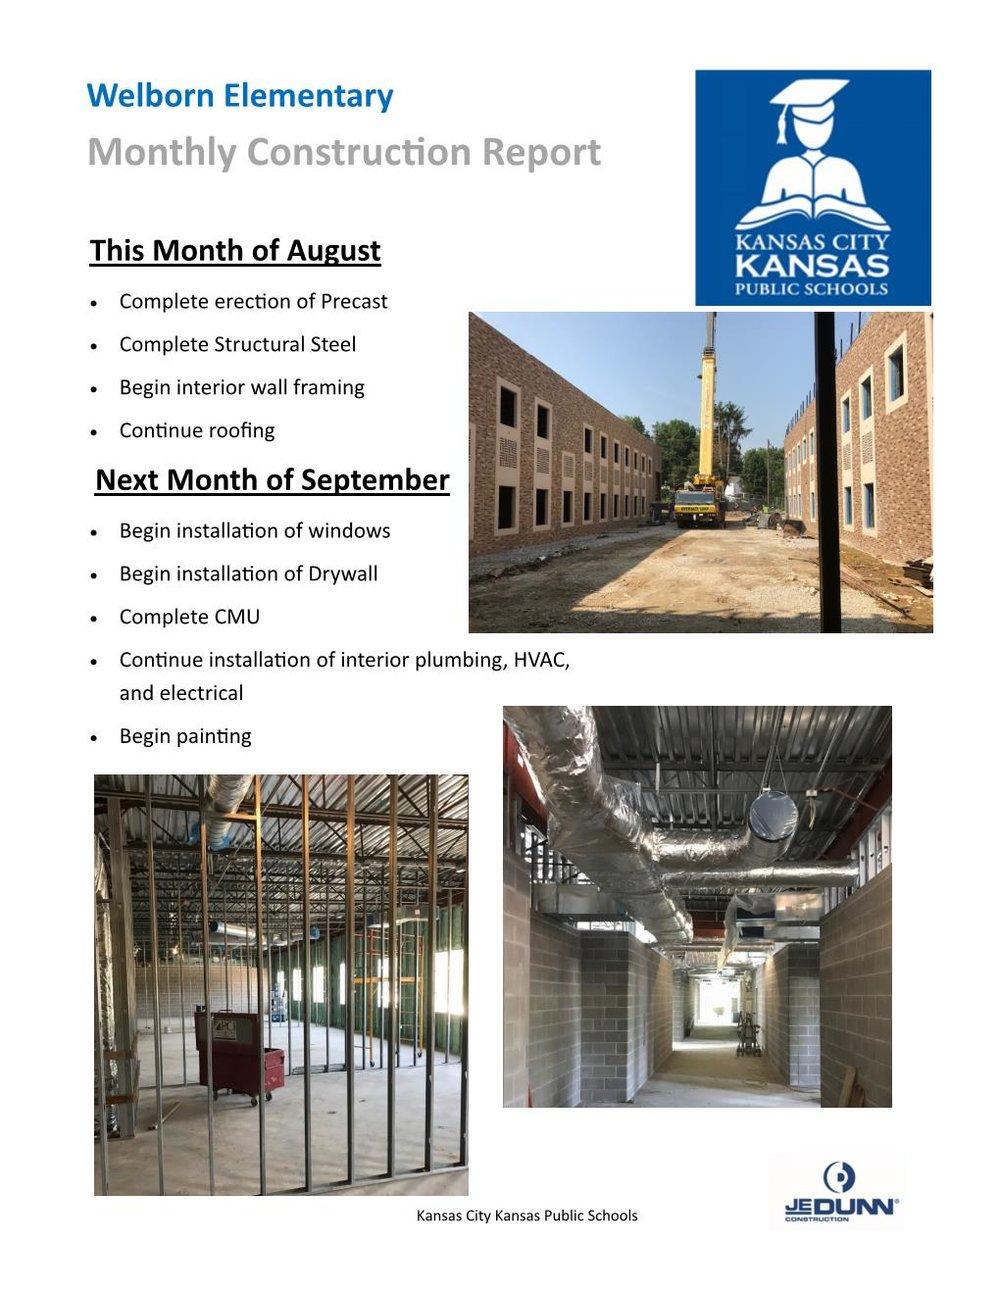 2018.08.25 - WP-08 August Photo Report Welborn.jpg